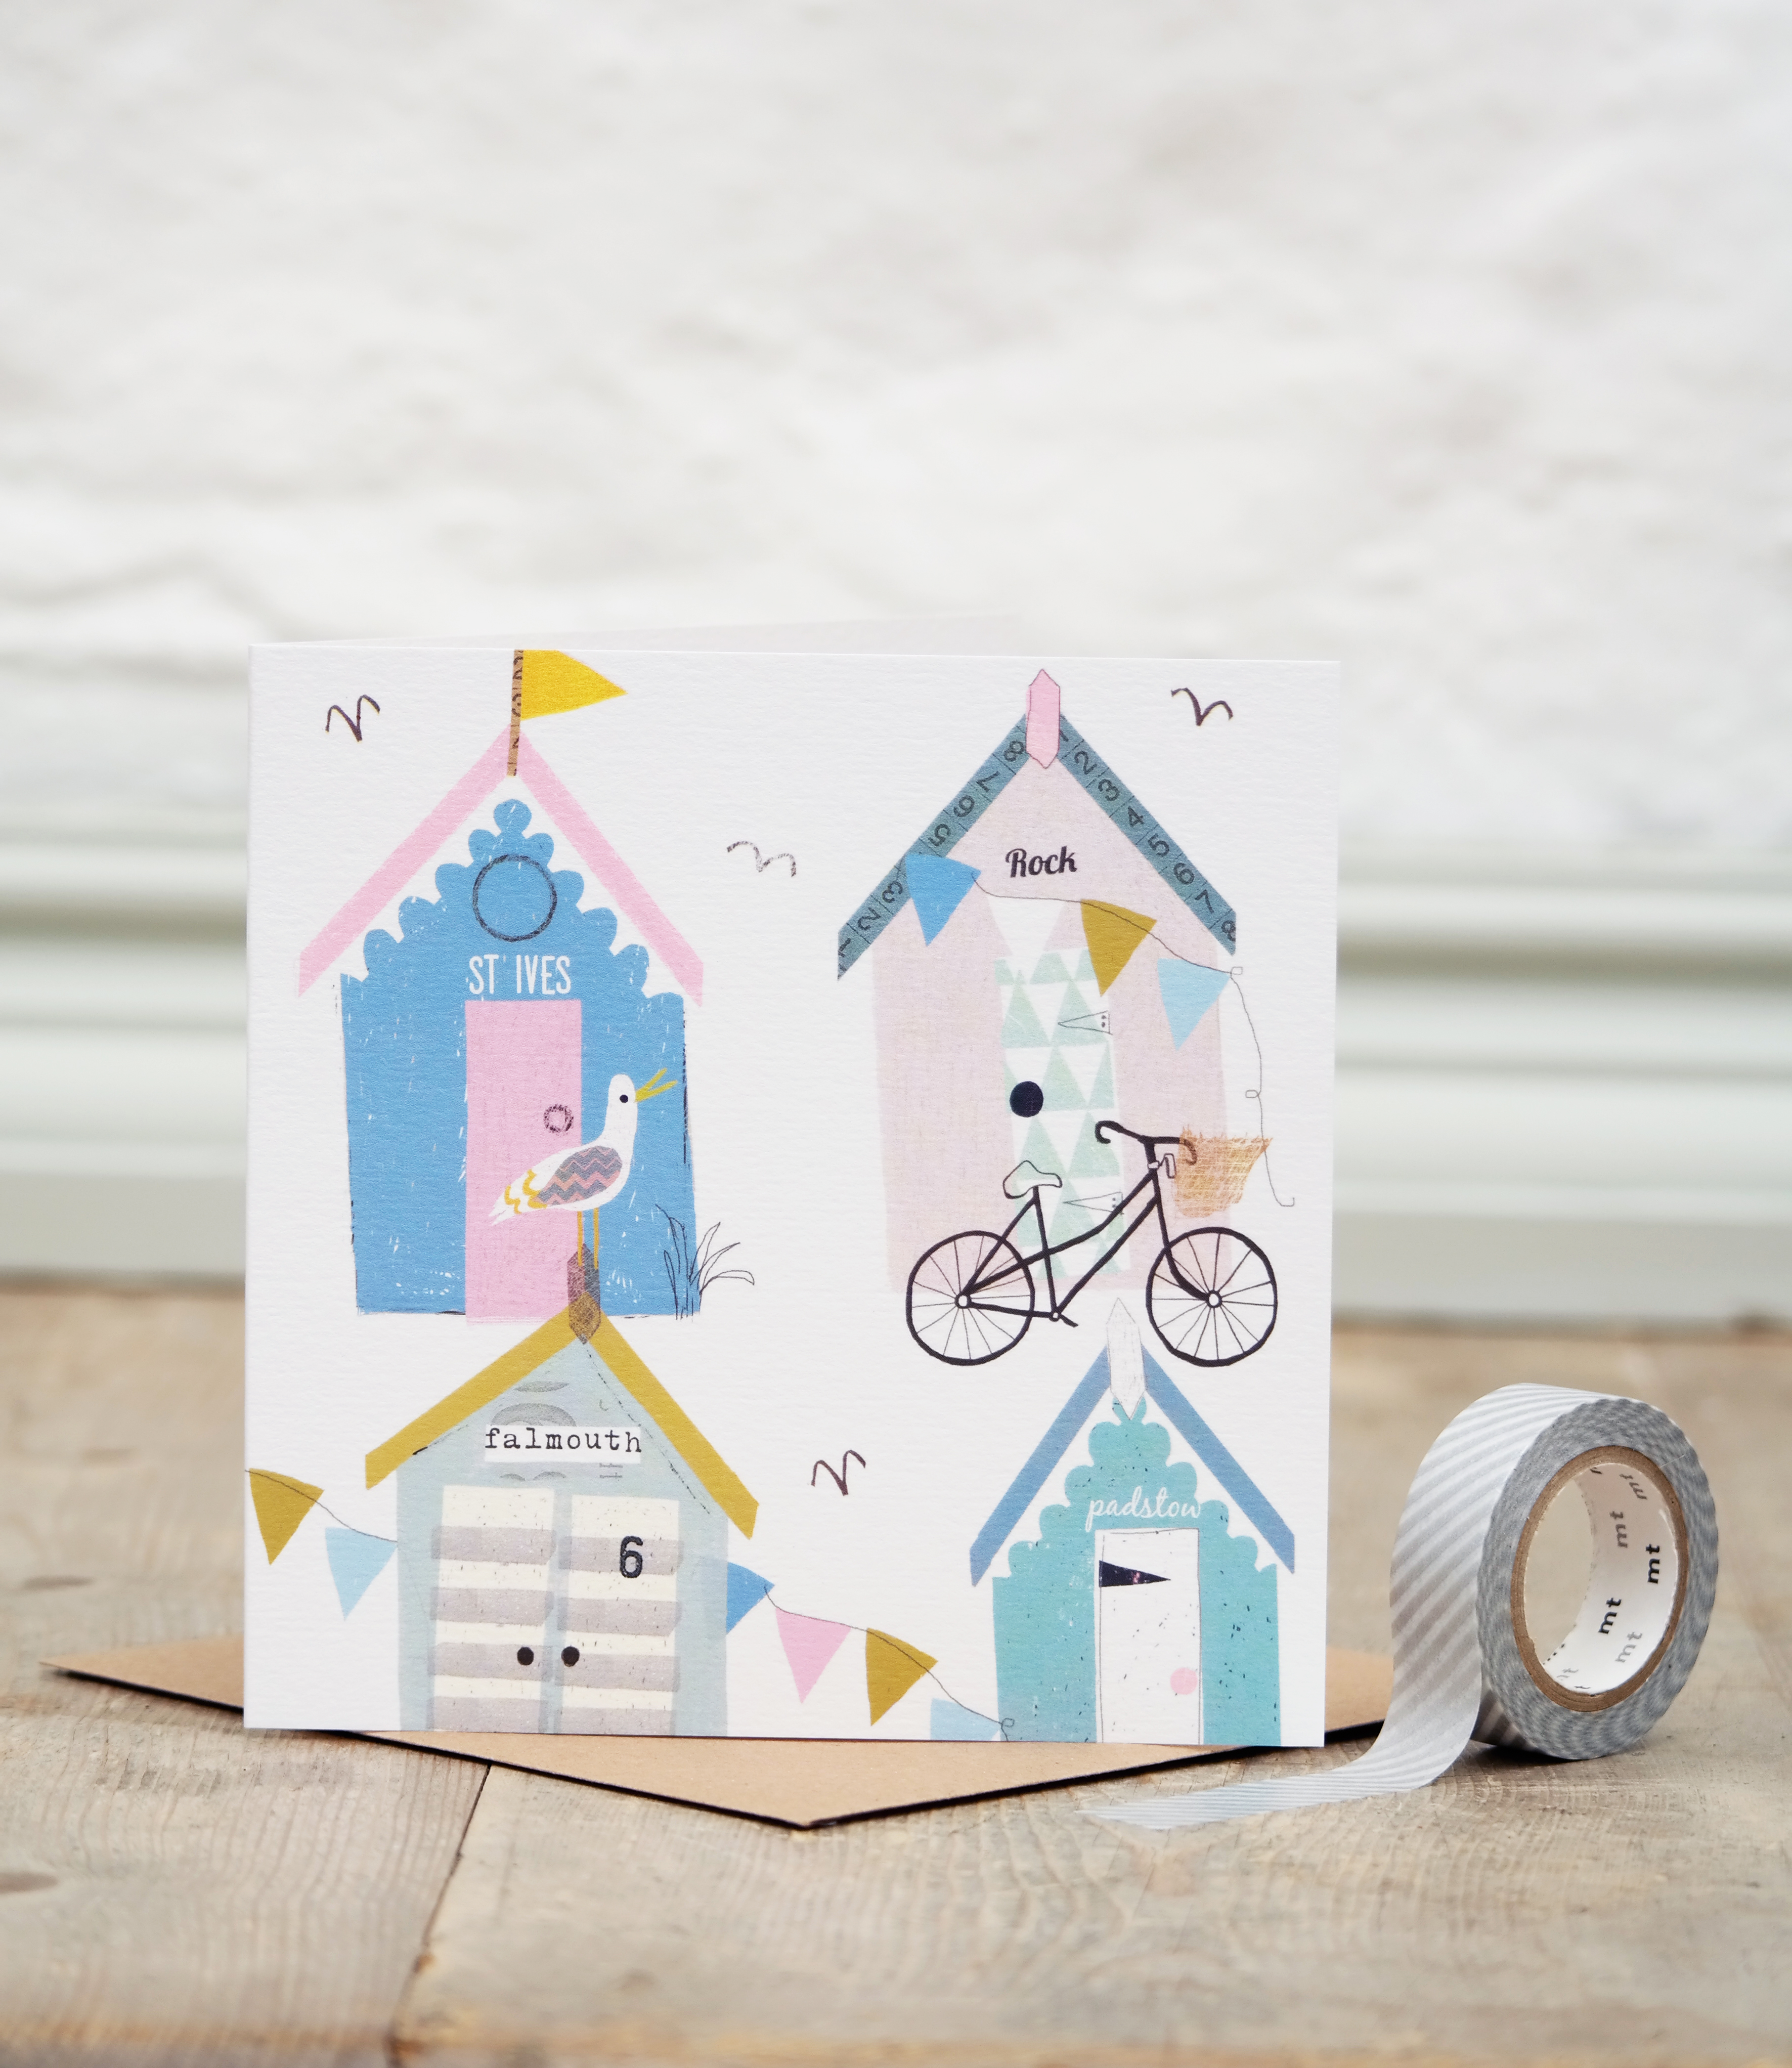 Anna victoria cornish beach huts greetings cards anna victoria cornish beach huts greetings cards kristyandbryce Gallery